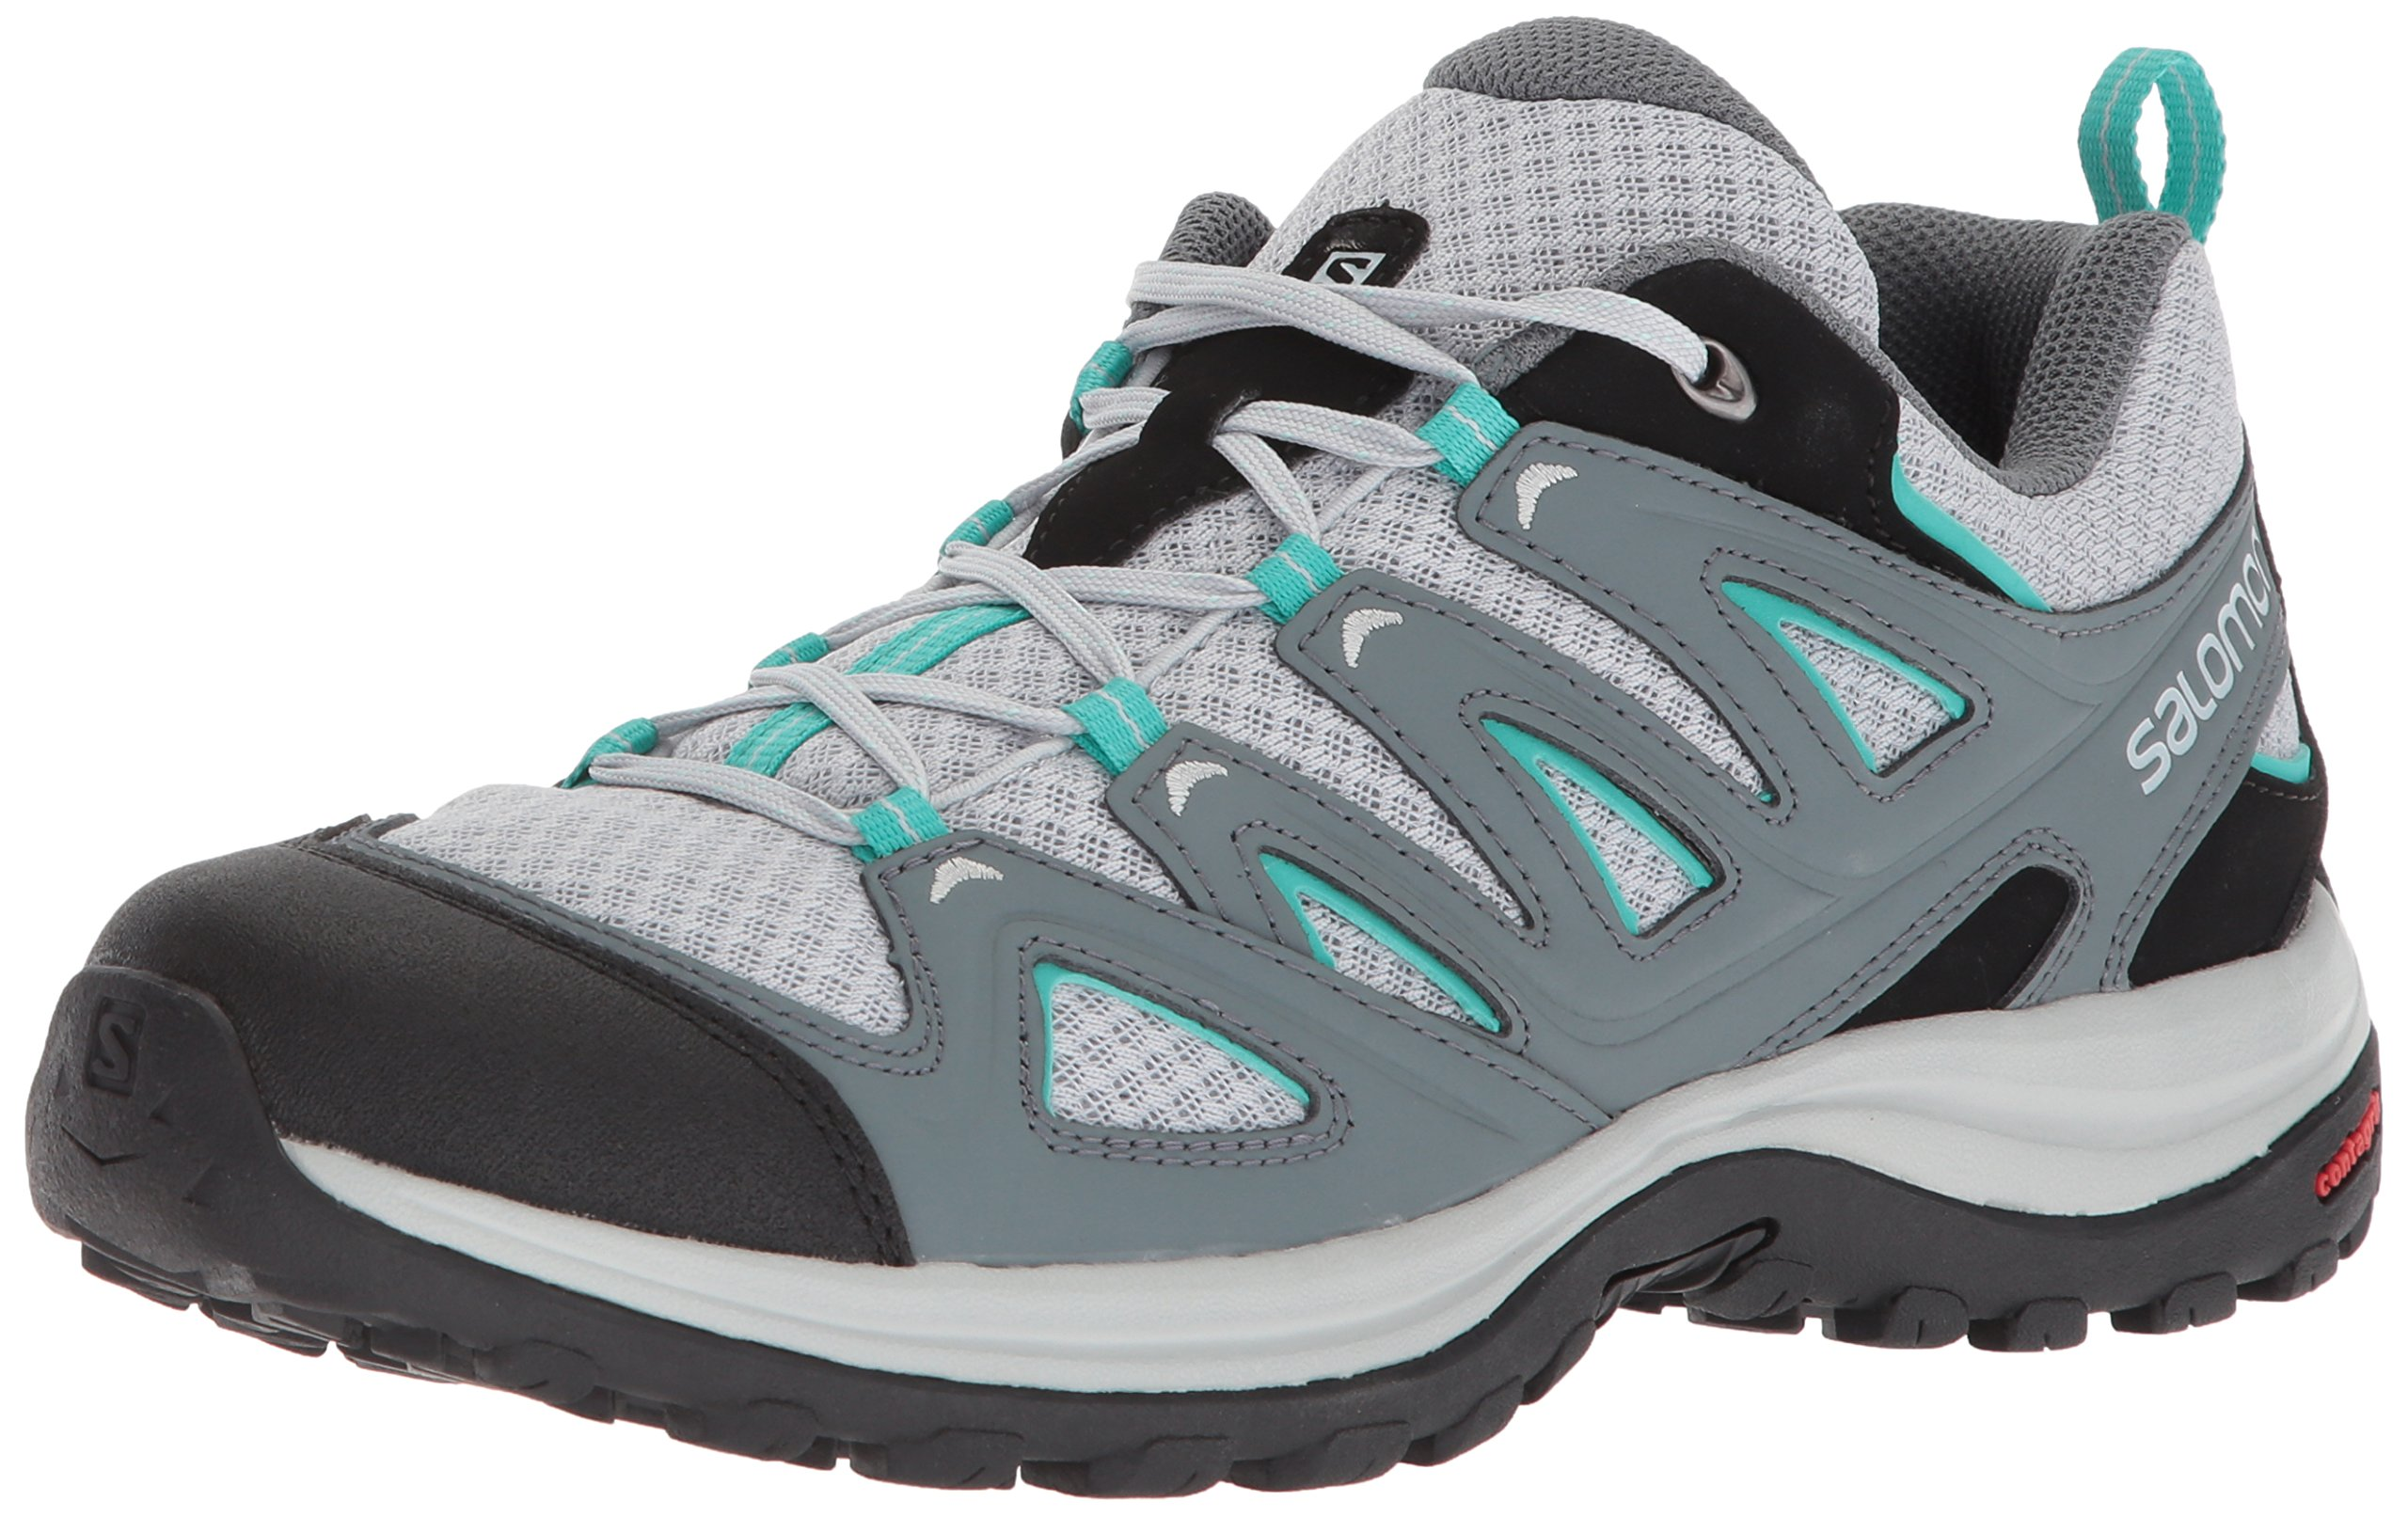 Salomon Women's Ellipse 3 AERO W USA Trail Running Shoe, Quarry, 9 M US